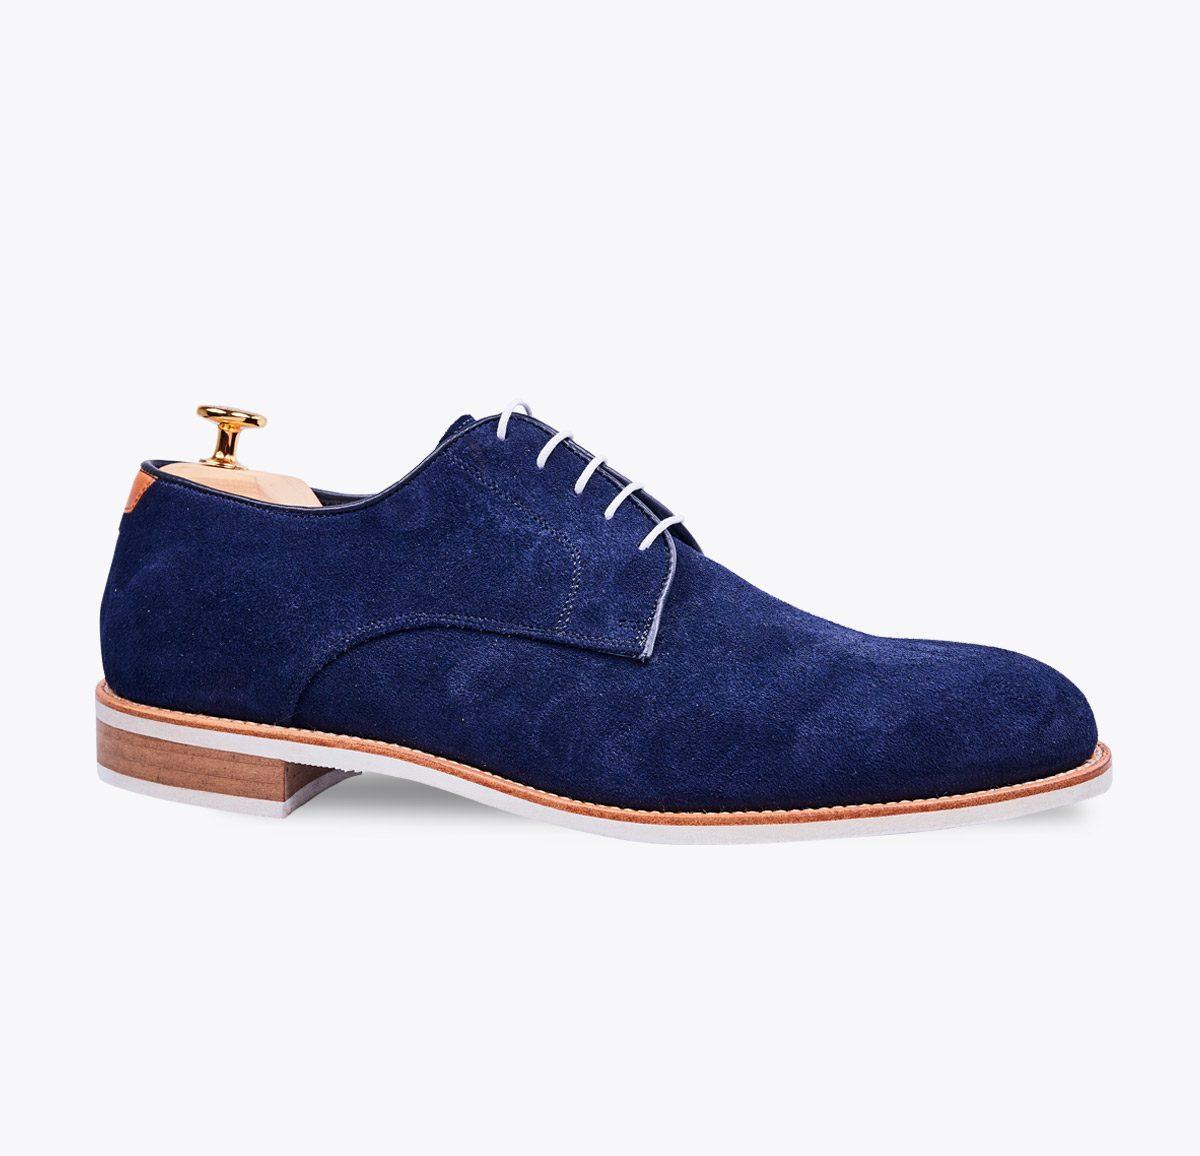 Zapato Summer 1 azul marino hecho a mano en mandalashoes, Santanyí Mallorca. Hand made shoes. Nach Mass Schuhe